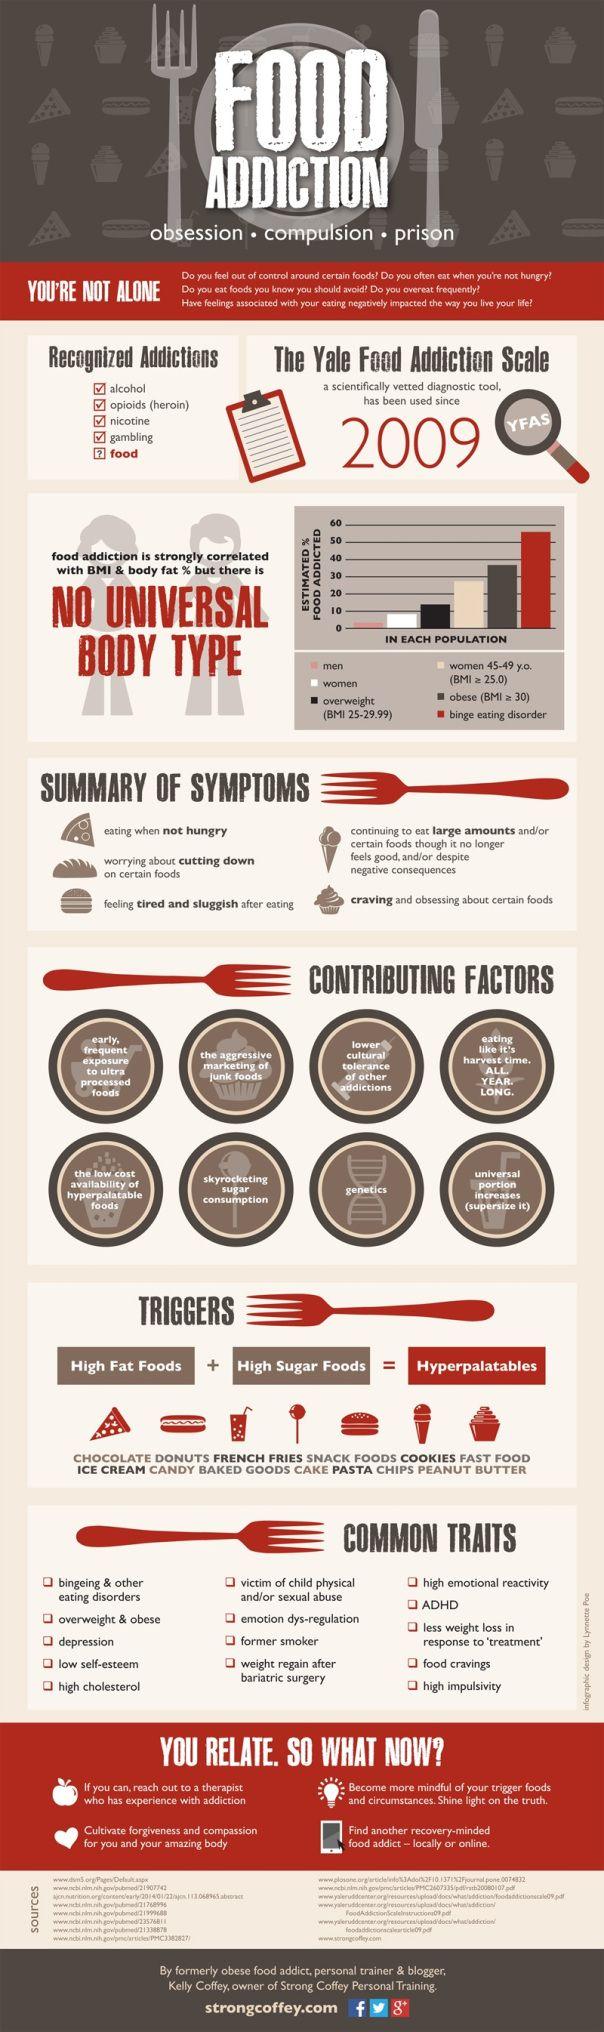 Food Addiction Infographic  #addiction #foodaddicton #infographic